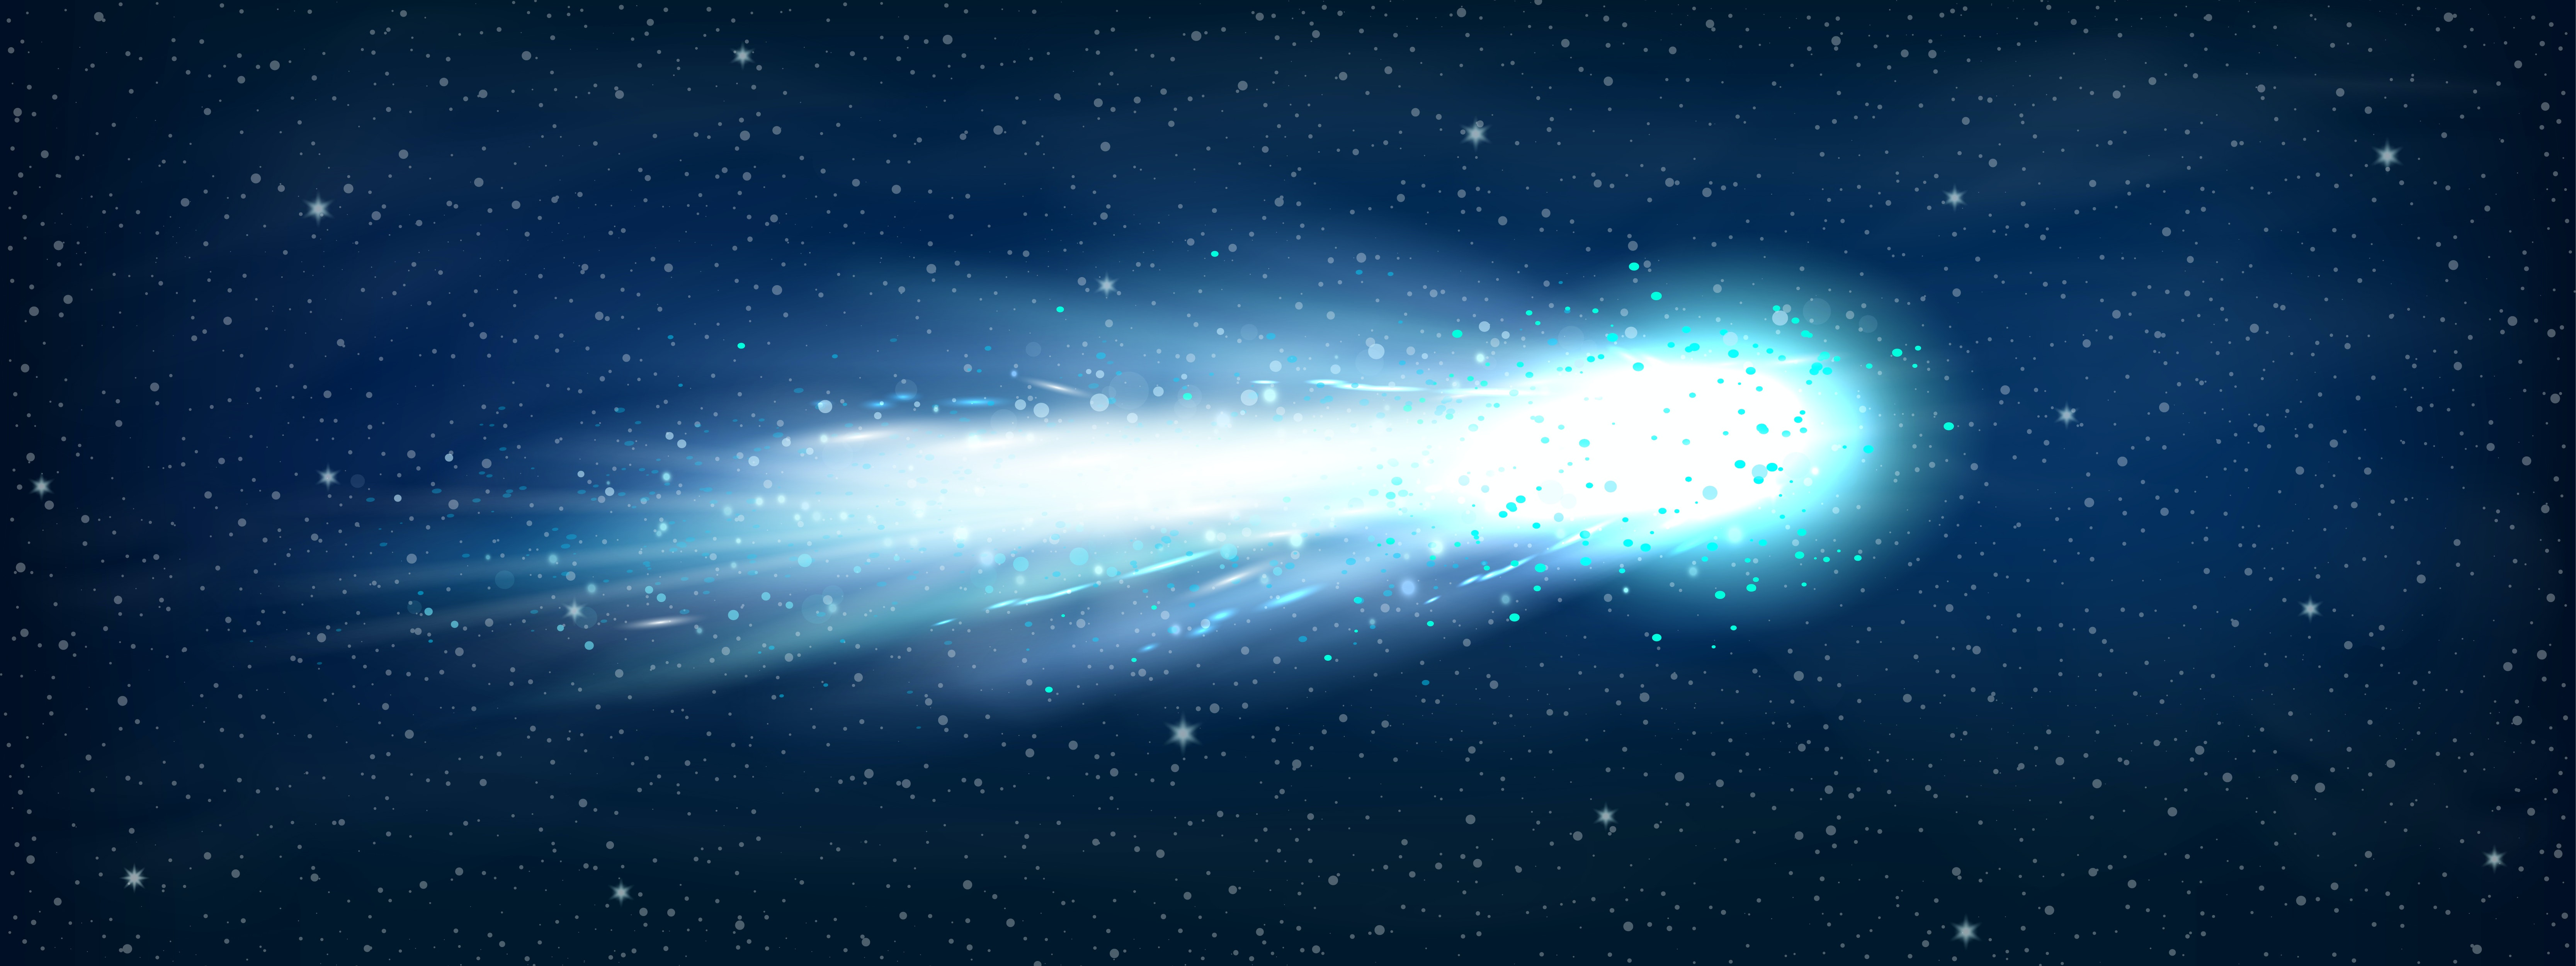 Comet Borisov  Planet Formation Is  U0026quot A Puzzle That We Can U2019t Really Explain U0026quot